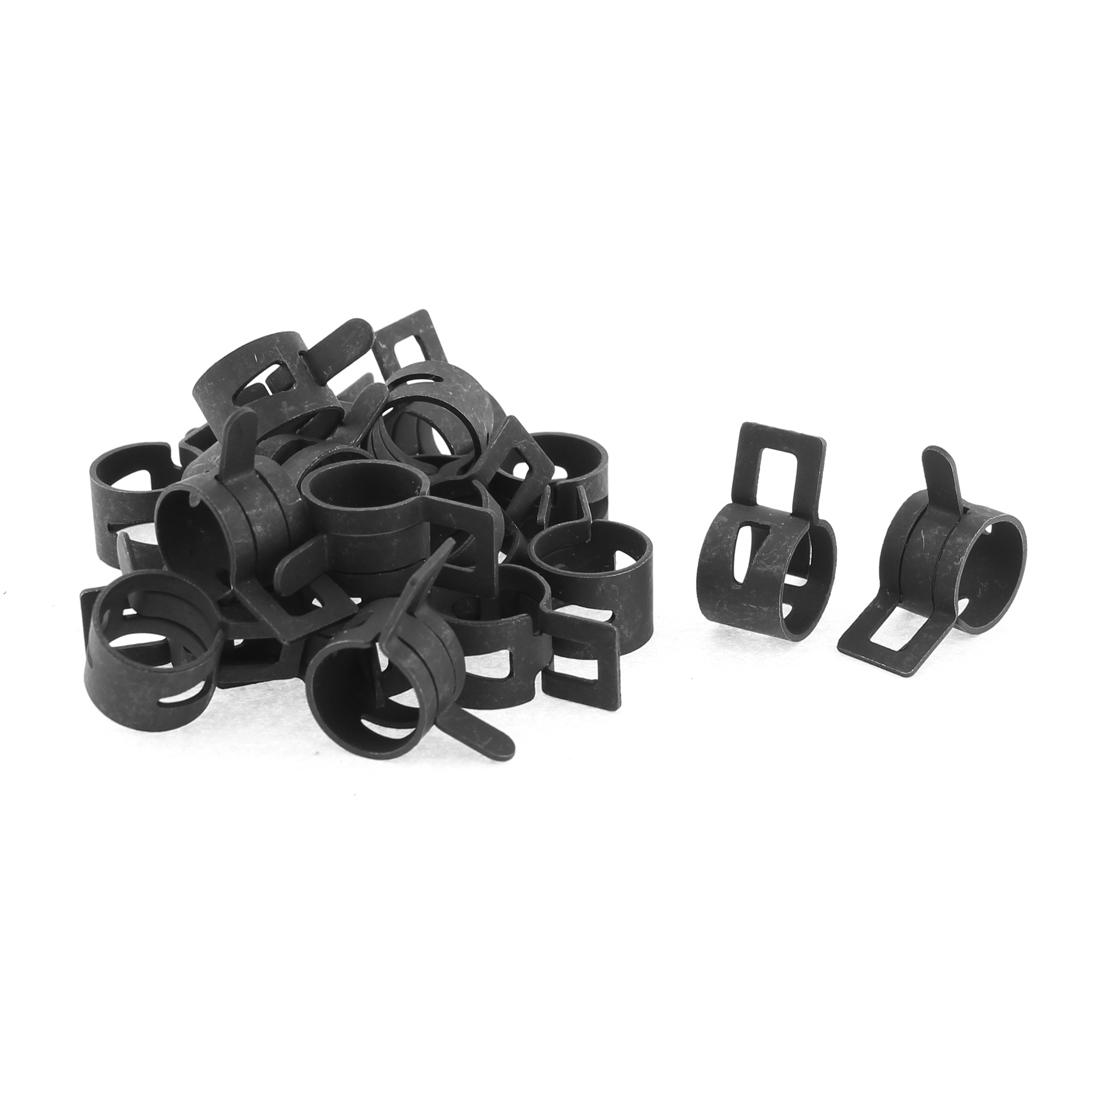 20 Pcs Black Vacuum Fuel Oil Hose Metal Spring Clip Clamps